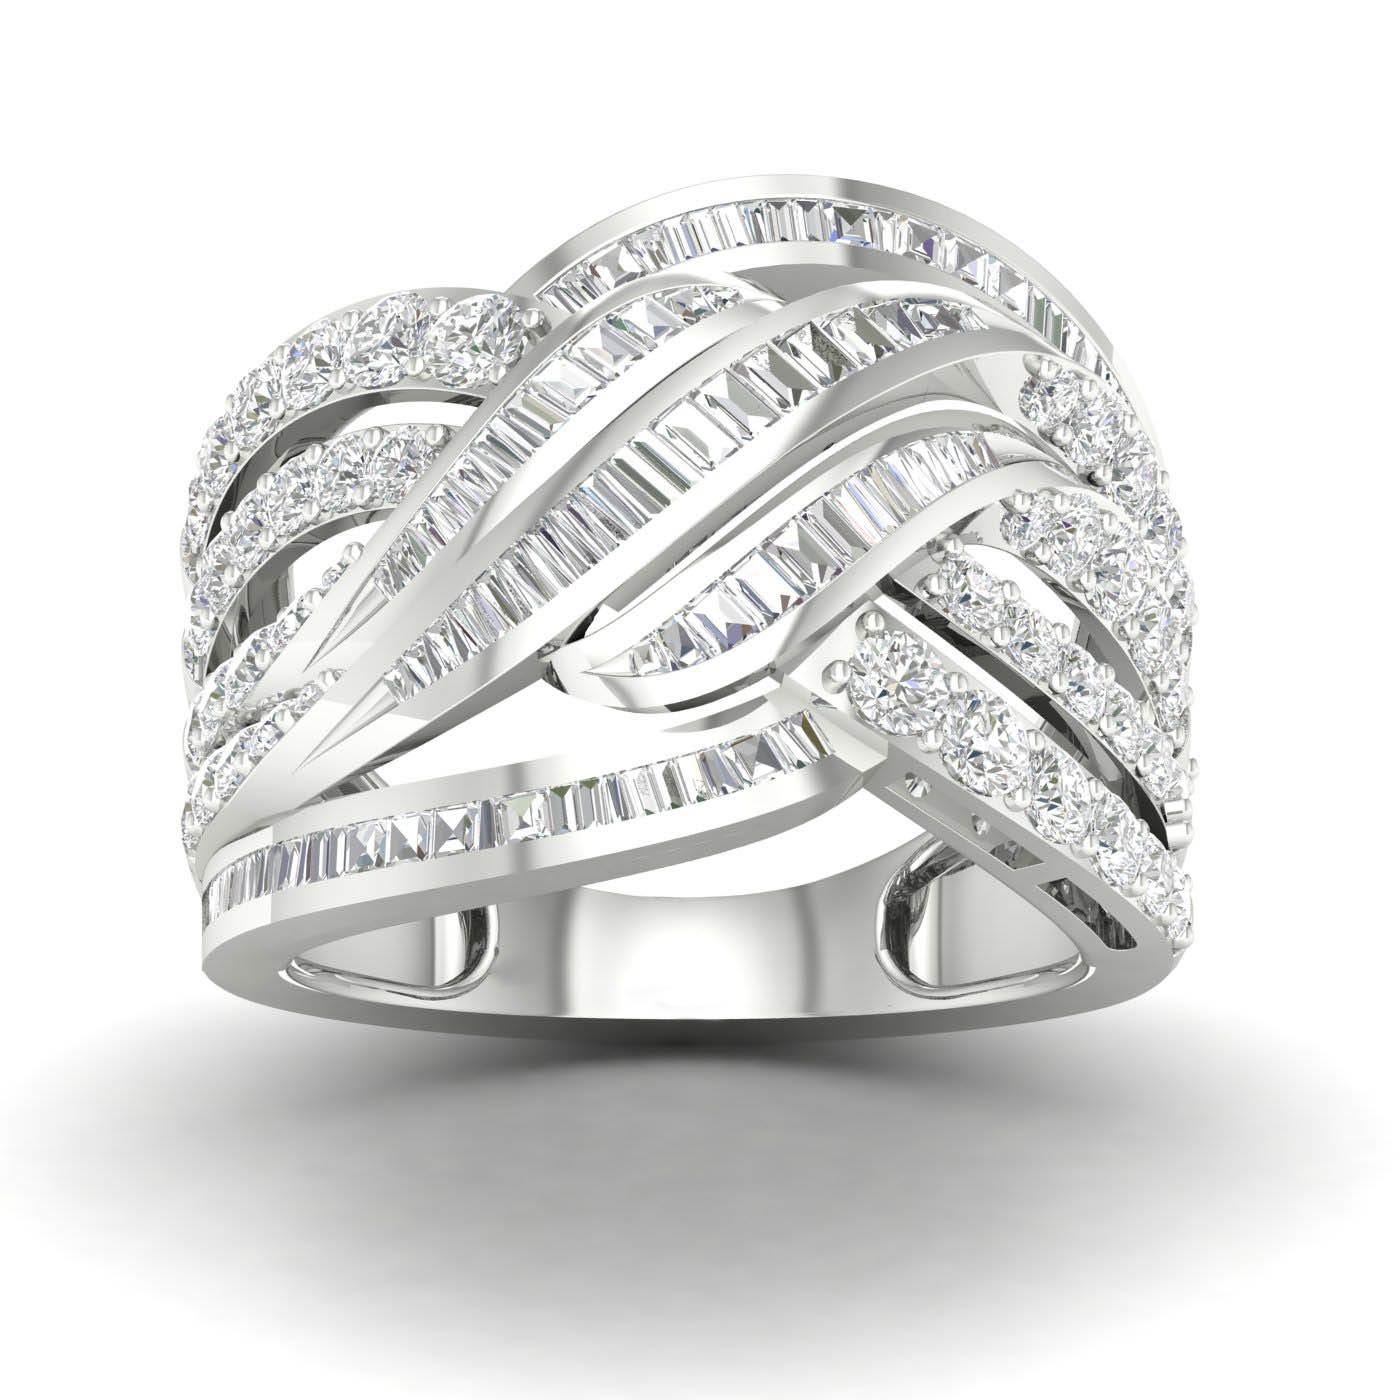 Twist Fashion Ring 1.50ctw in 10k White Gold